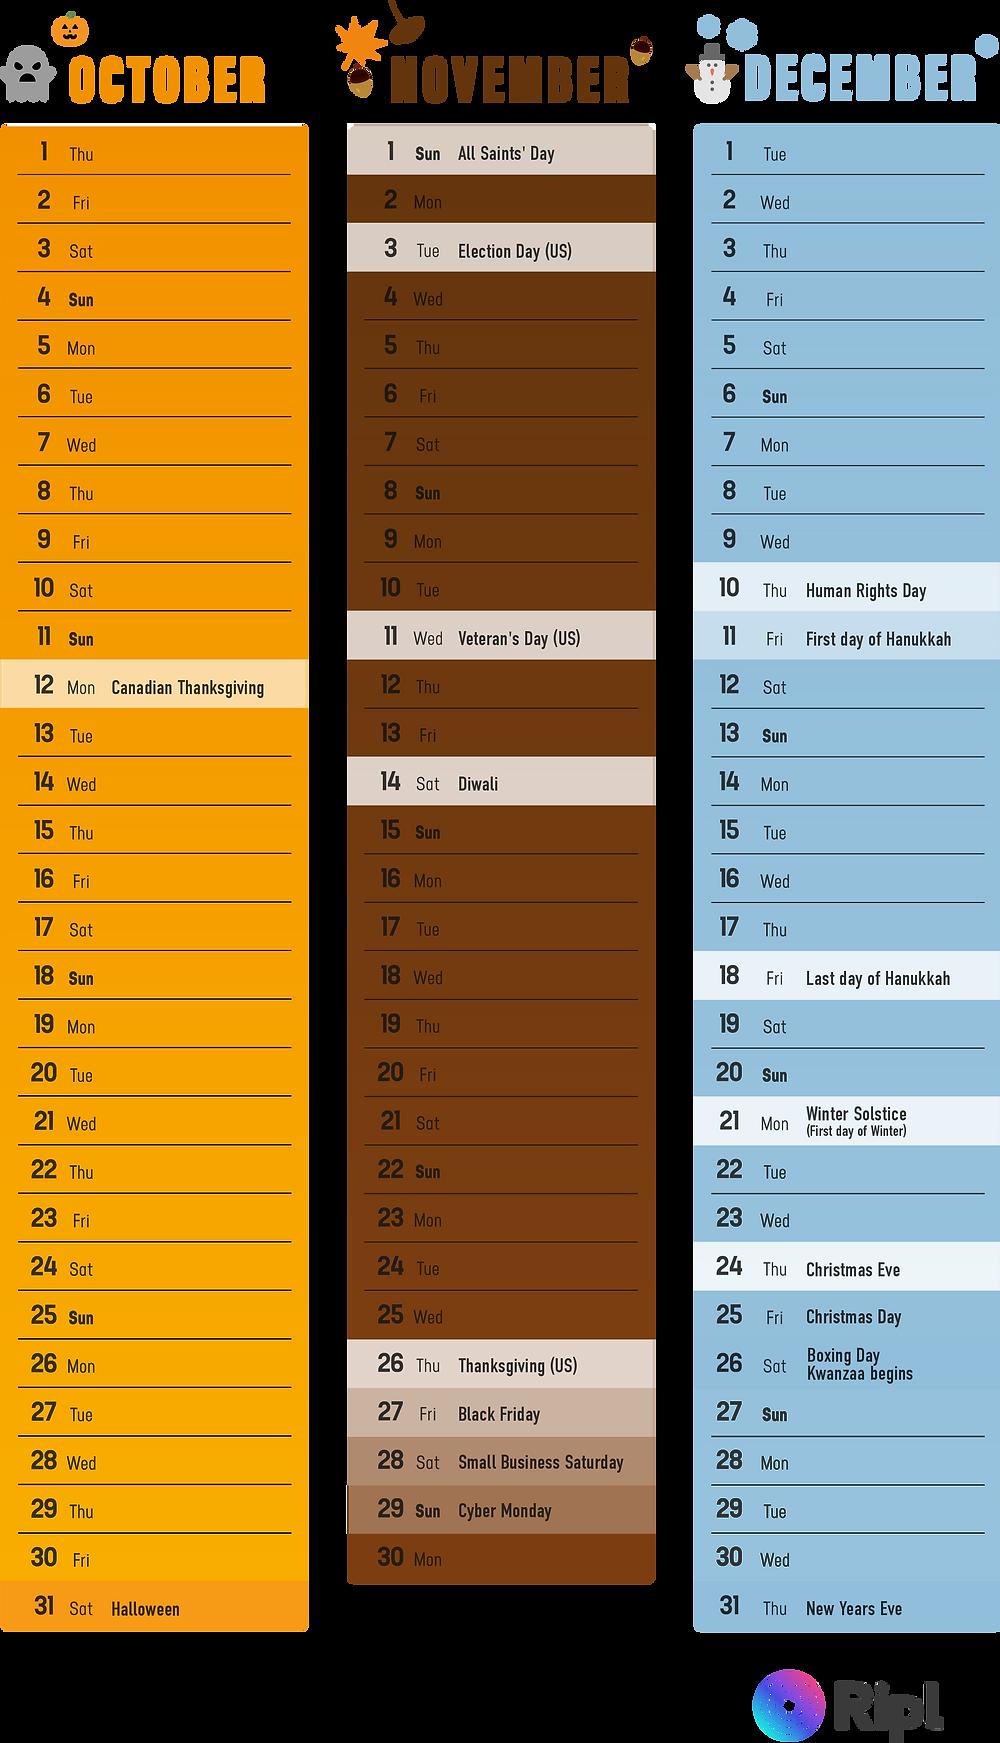 Social media content calendar for October, November, and December 2020